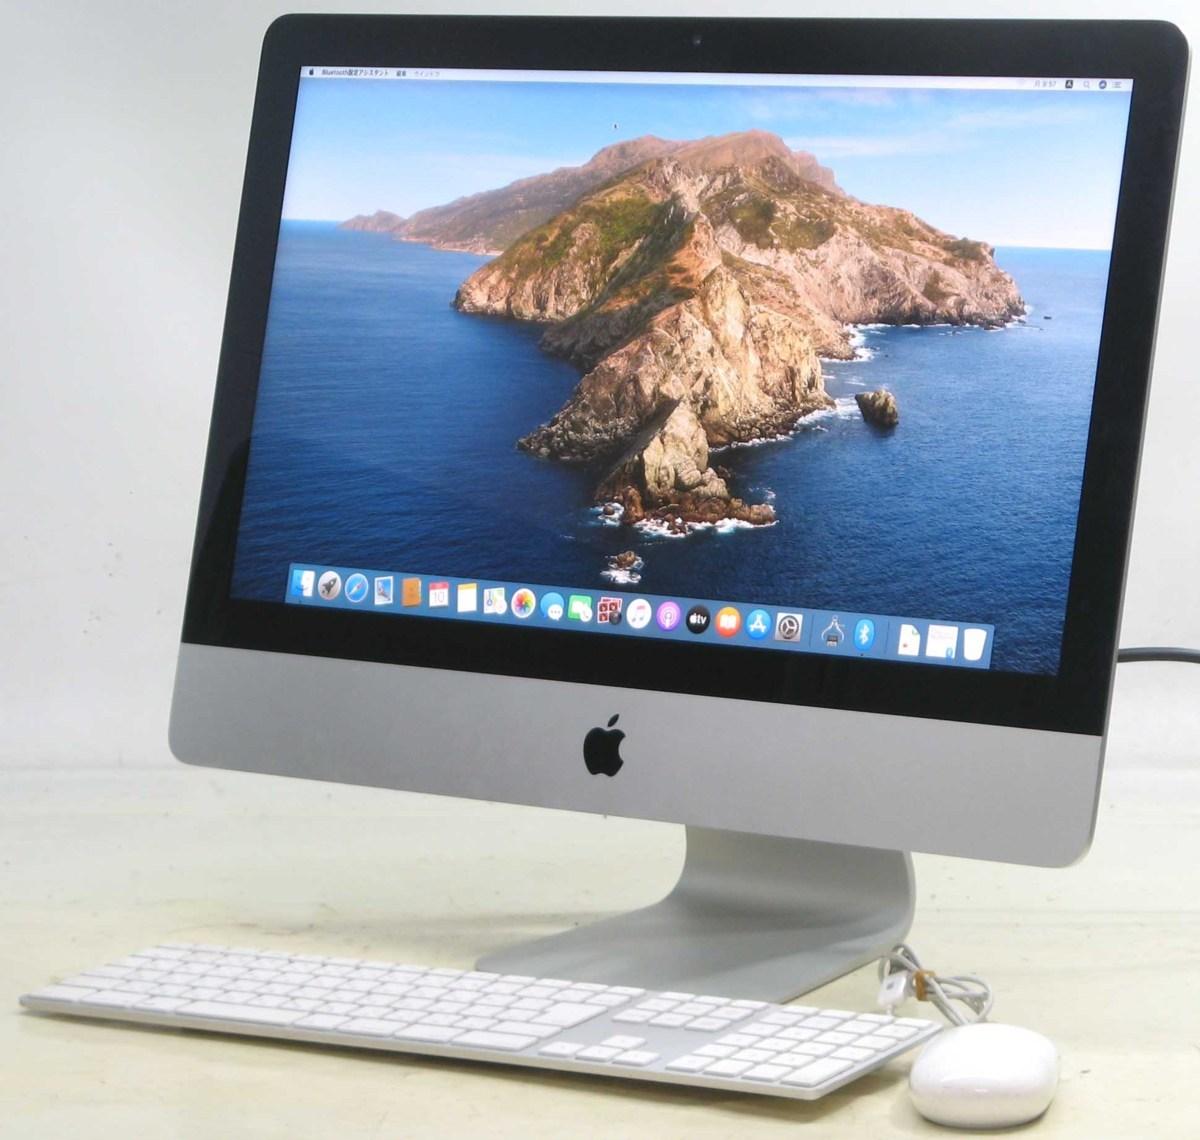 Apple iMac ME086J/A Corei5 2.7GHz 8GB HDD1TB 21.5インチ Mac OS 10.15.3 無線 Bluetooth Webカメラ アップル マック マッキントッシュ 中古パソコン 中古MAC